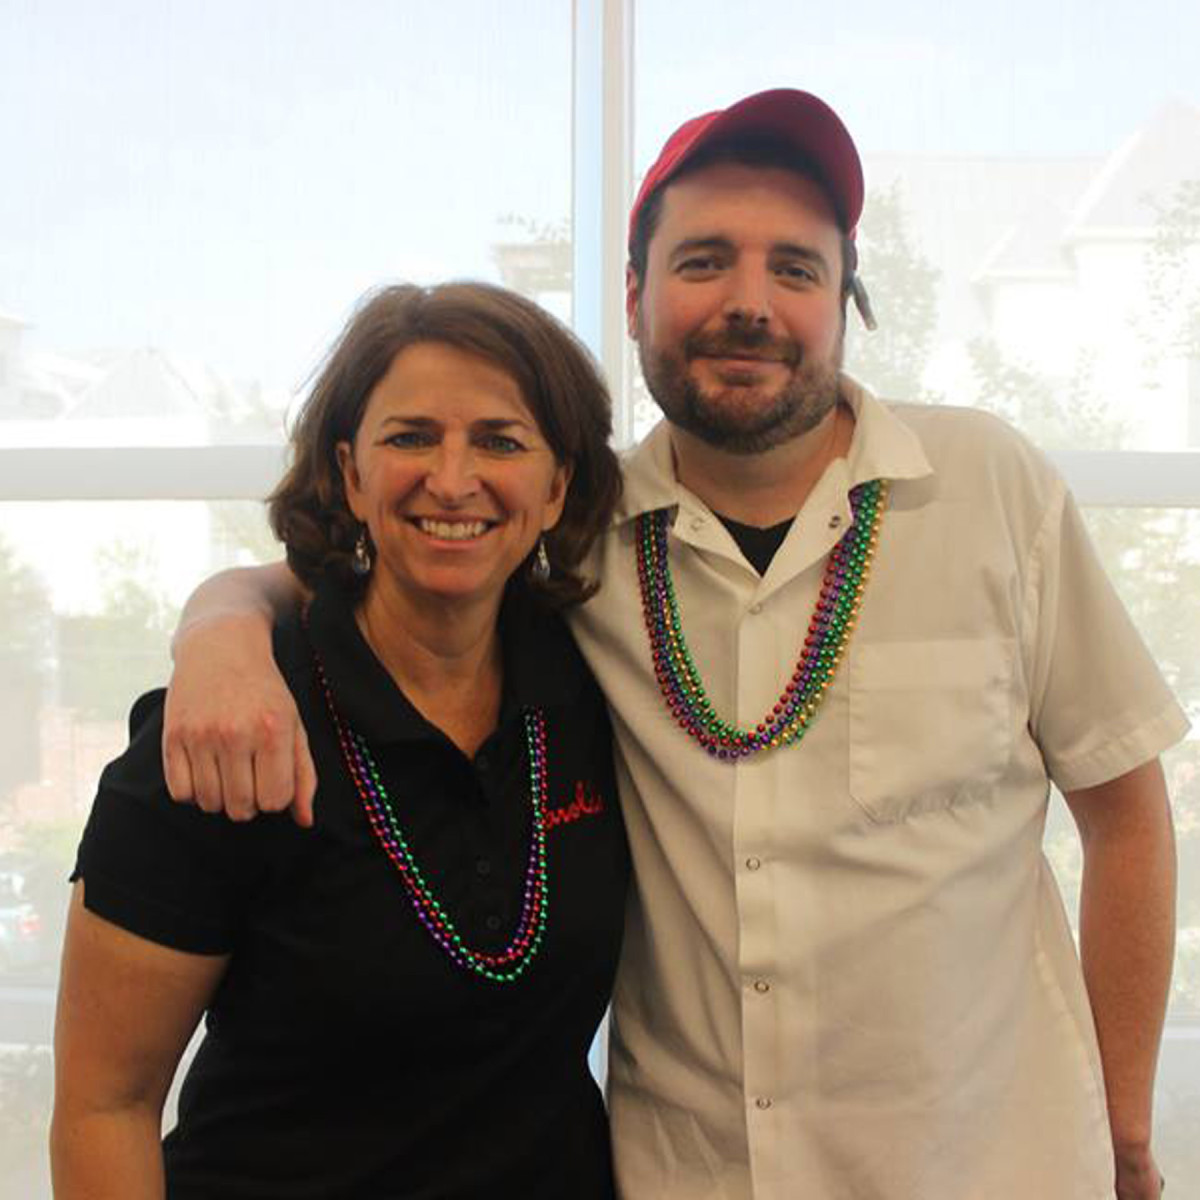 Dress for Success open house, 6/16 Alli Jarrett, Mike Hartley